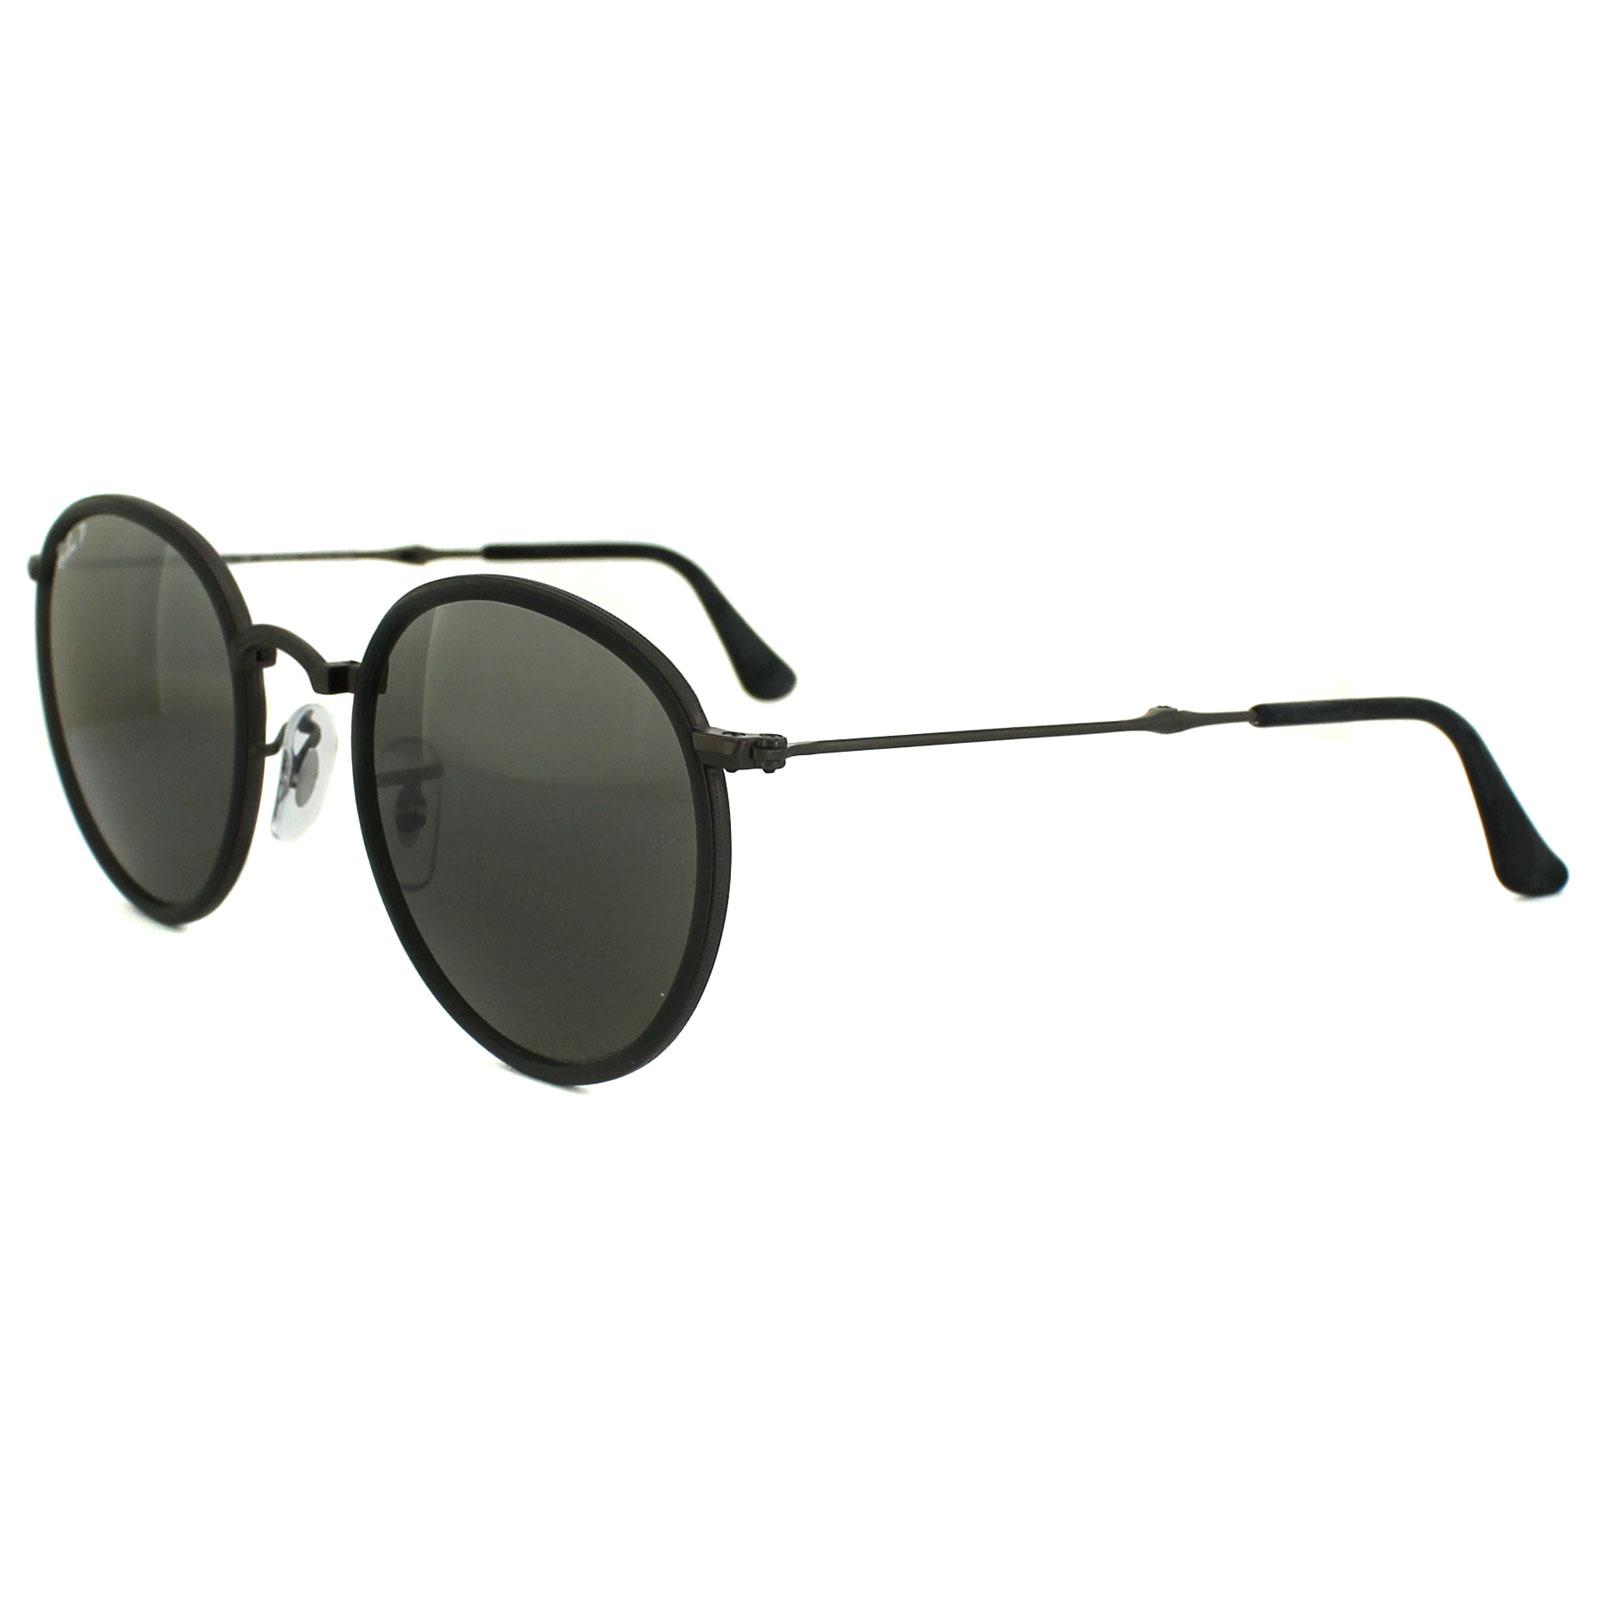 ray ban sonnenbrille round folding 3517 029 n8 gunmetal. Black Bedroom Furniture Sets. Home Design Ideas